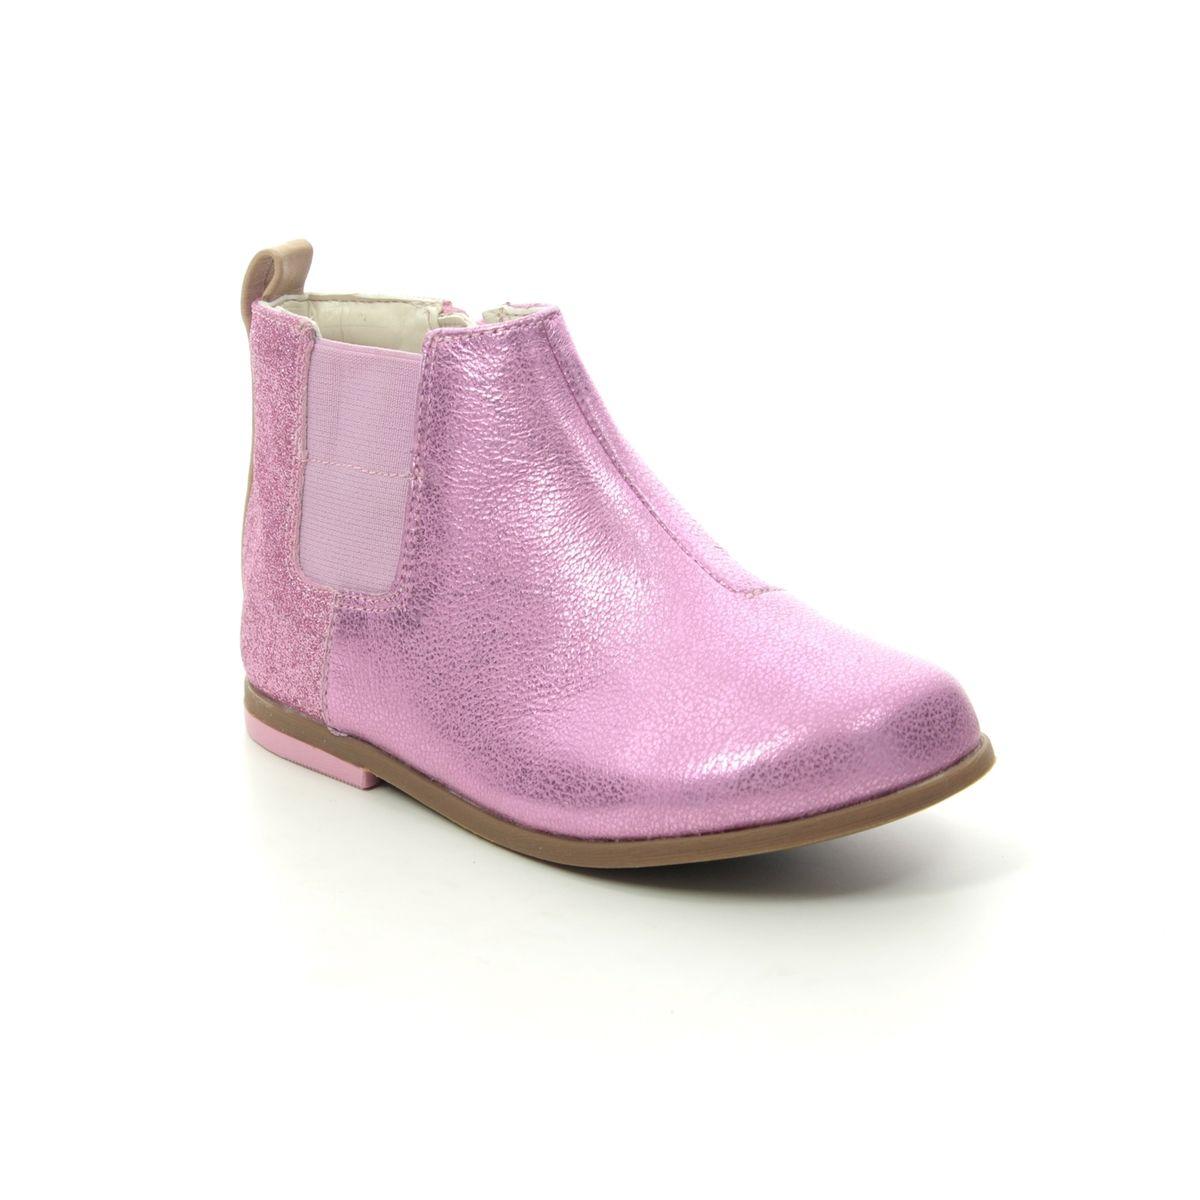 Clarks Drew Fun T F Fit Pink Leather